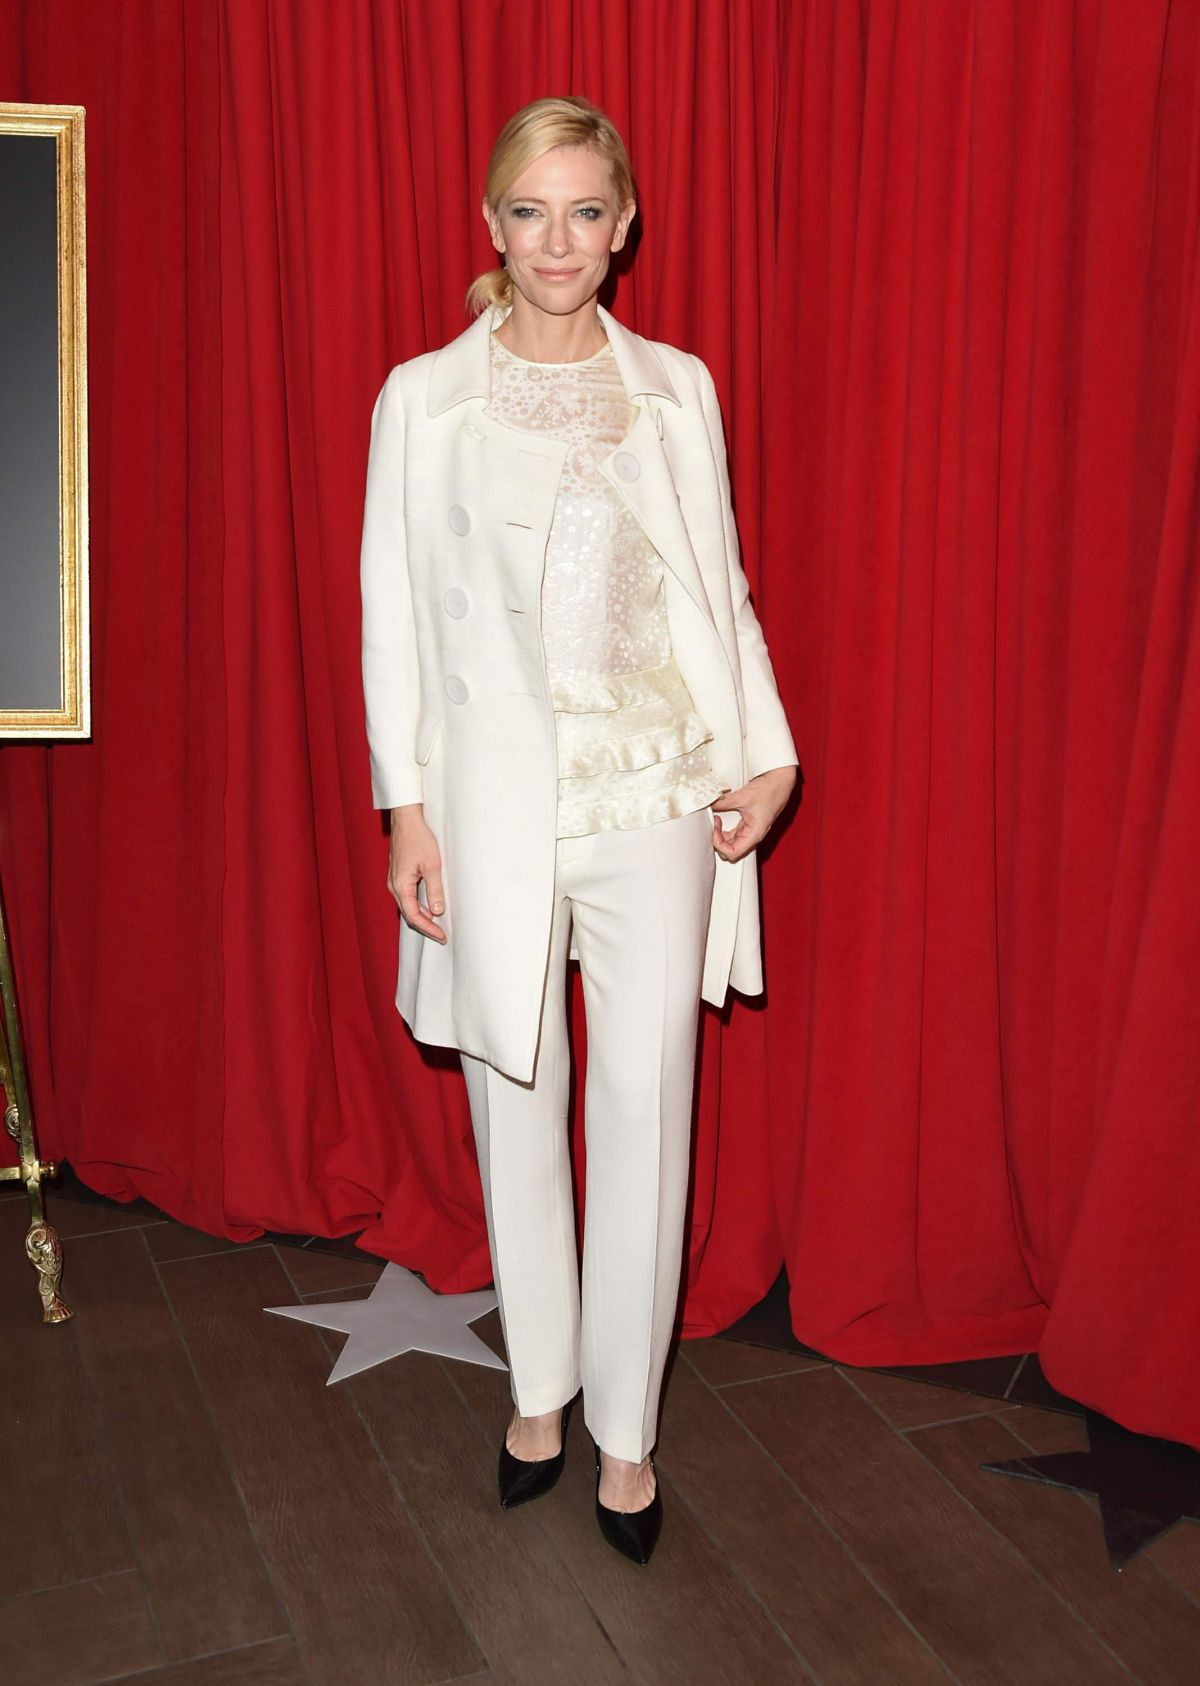 CATE BLANCHETT at AFI Awards 2016 in Beverly Hills 01/08 ... Cate Blanchett 2016